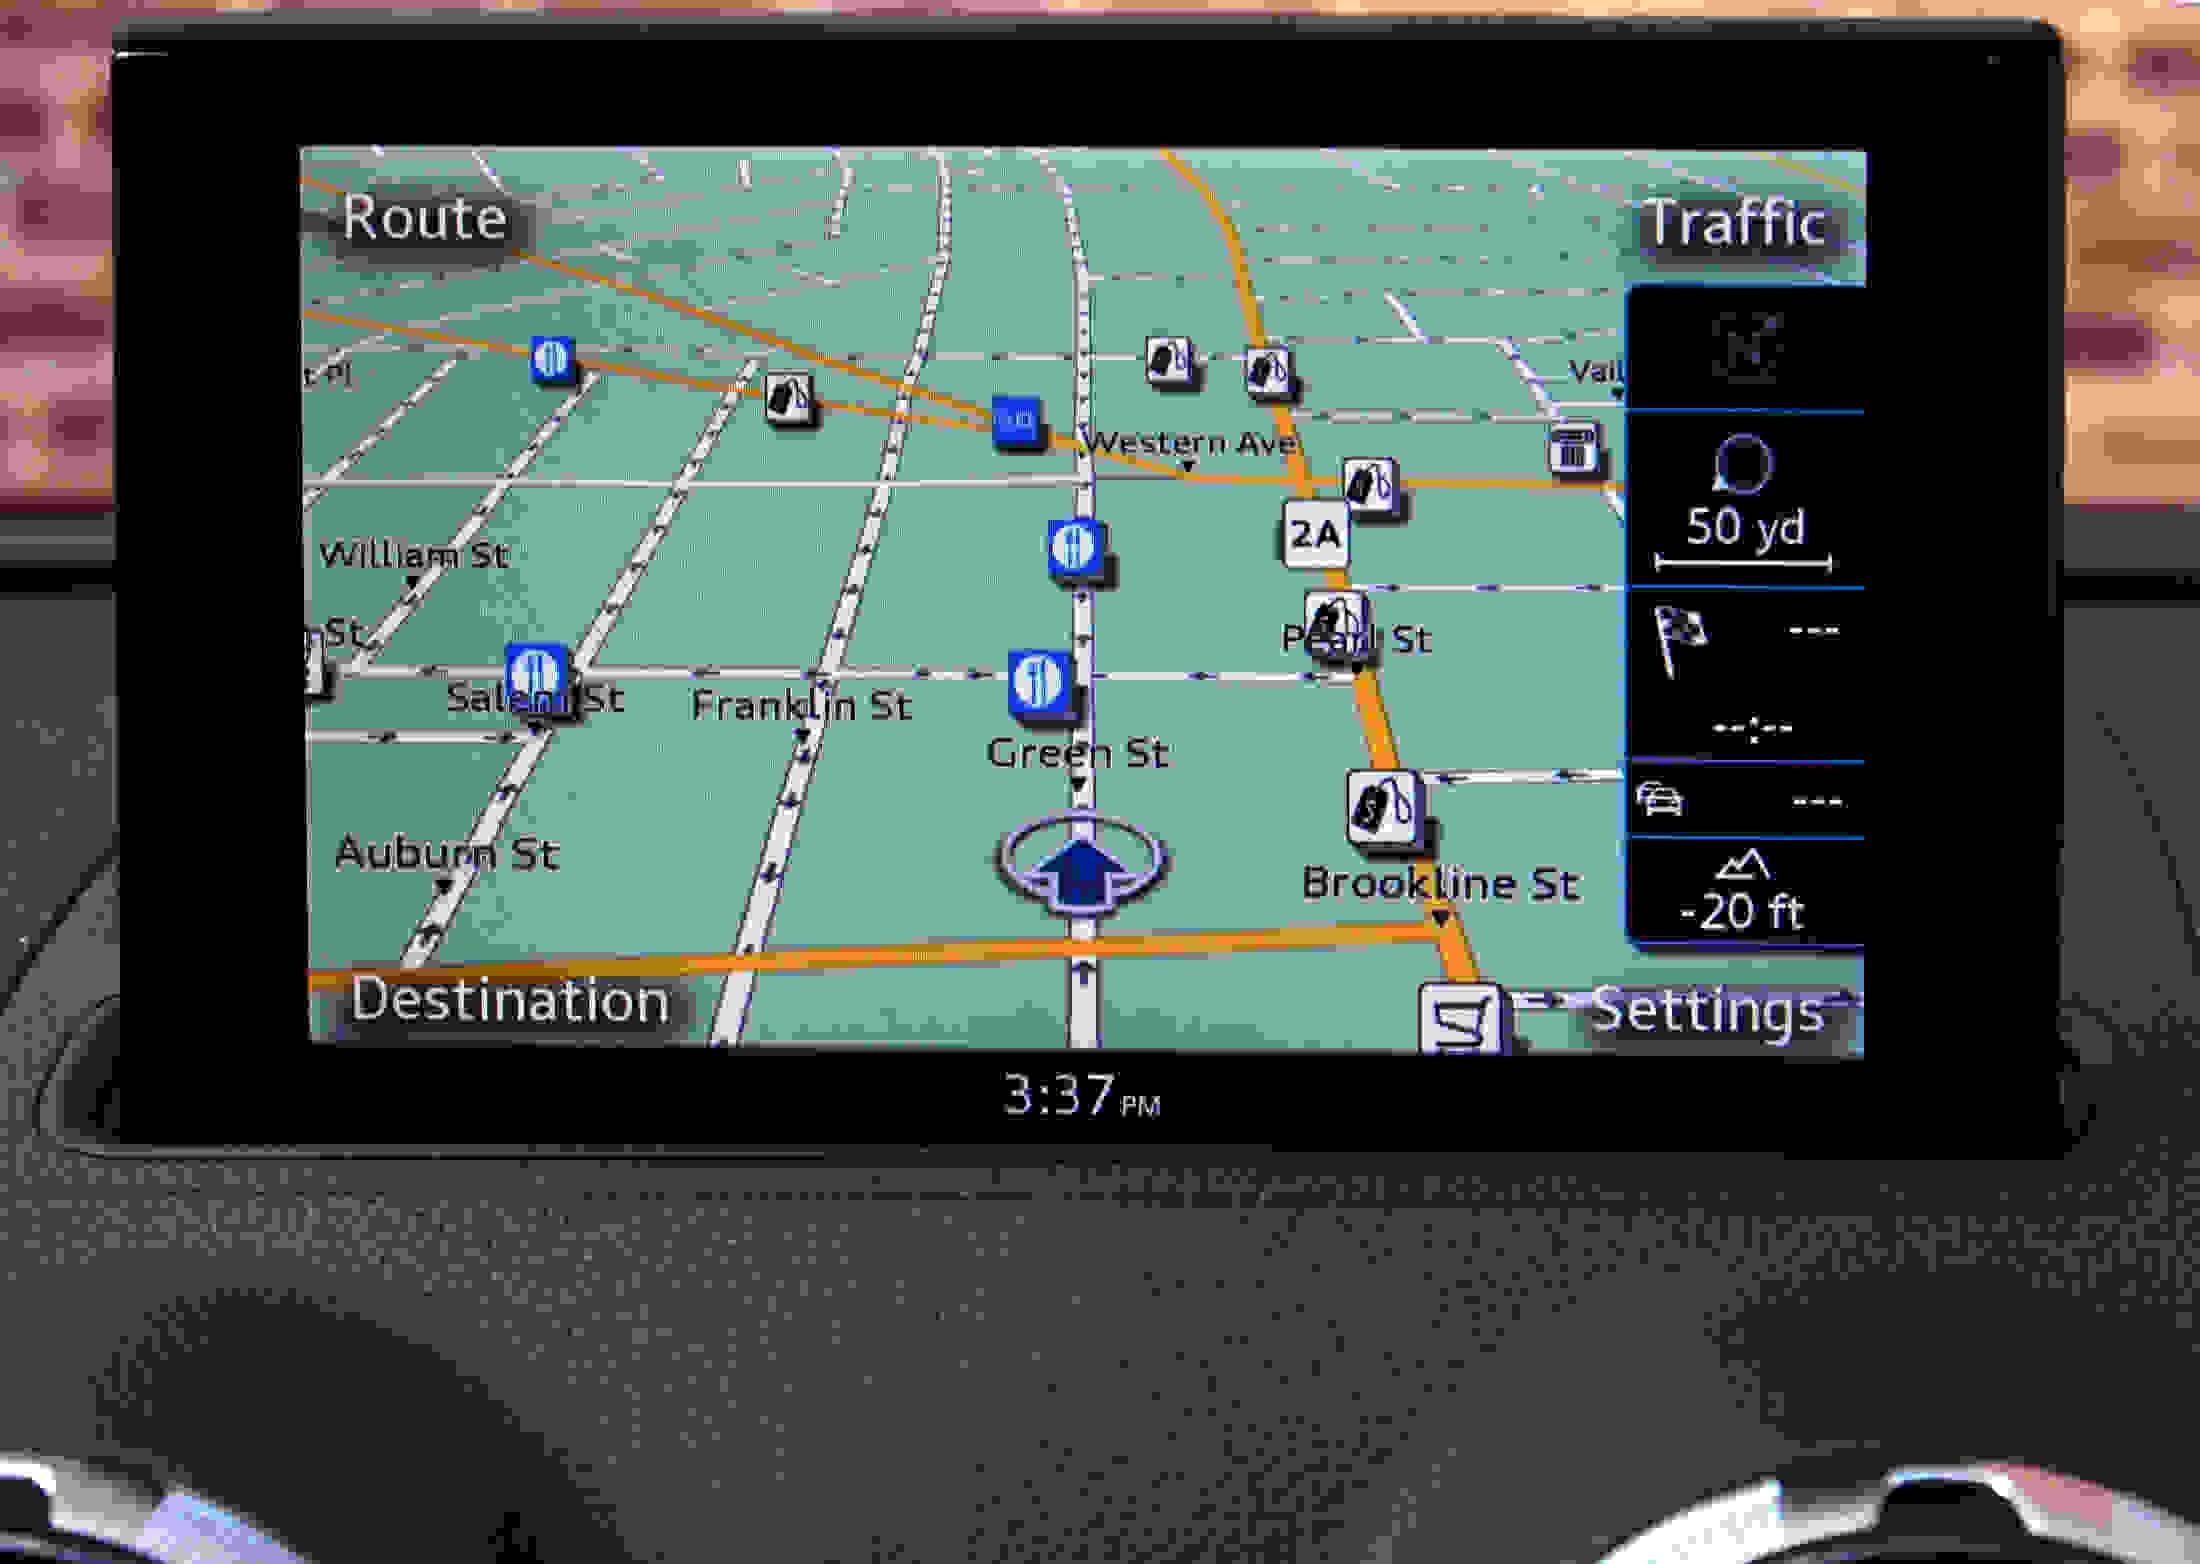 2015 Audi a3 nav screen